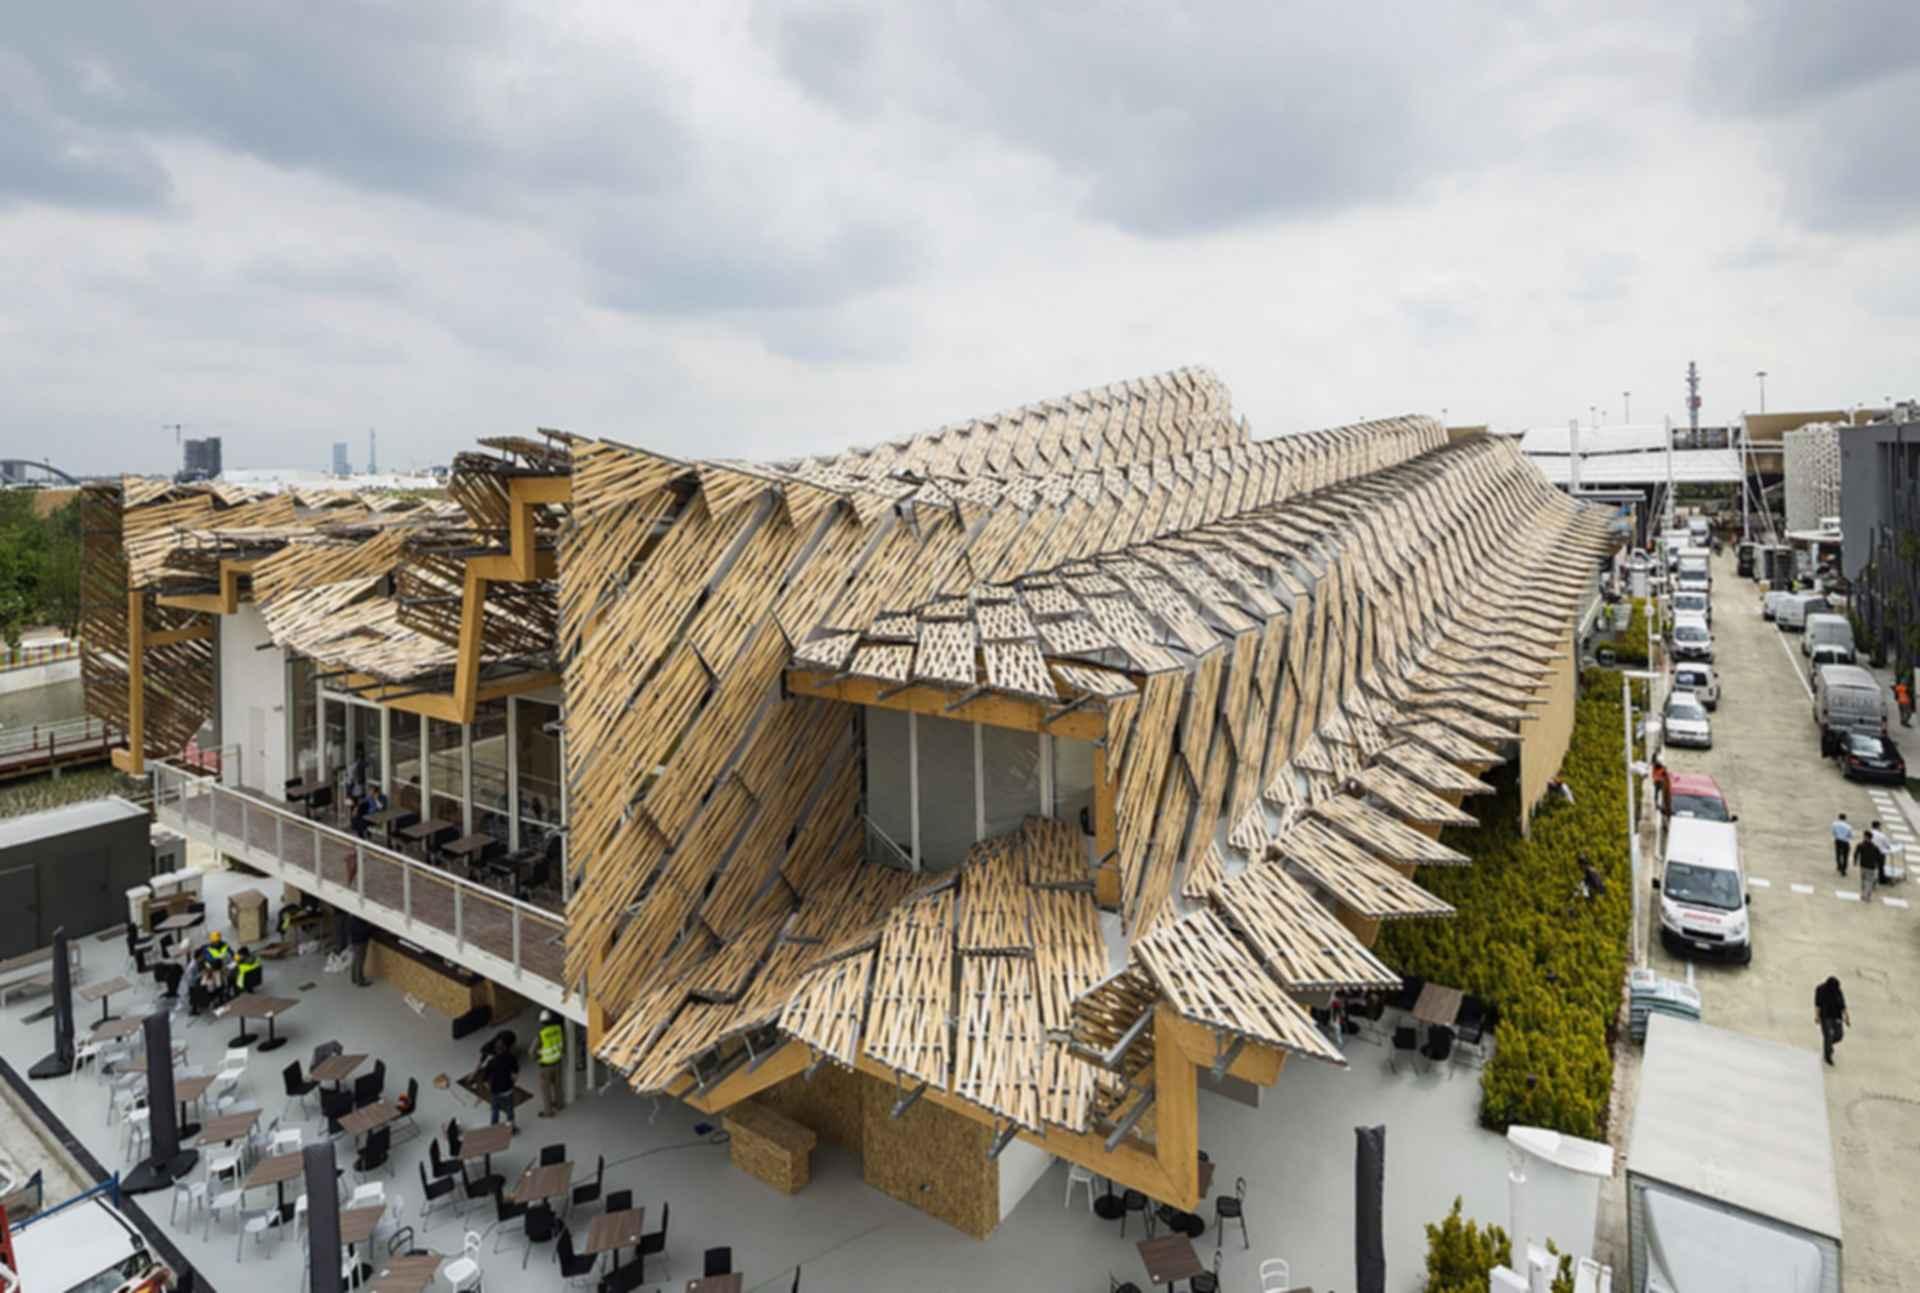 China Pavilion at Milan Expo 2015 - Exterior/Decking